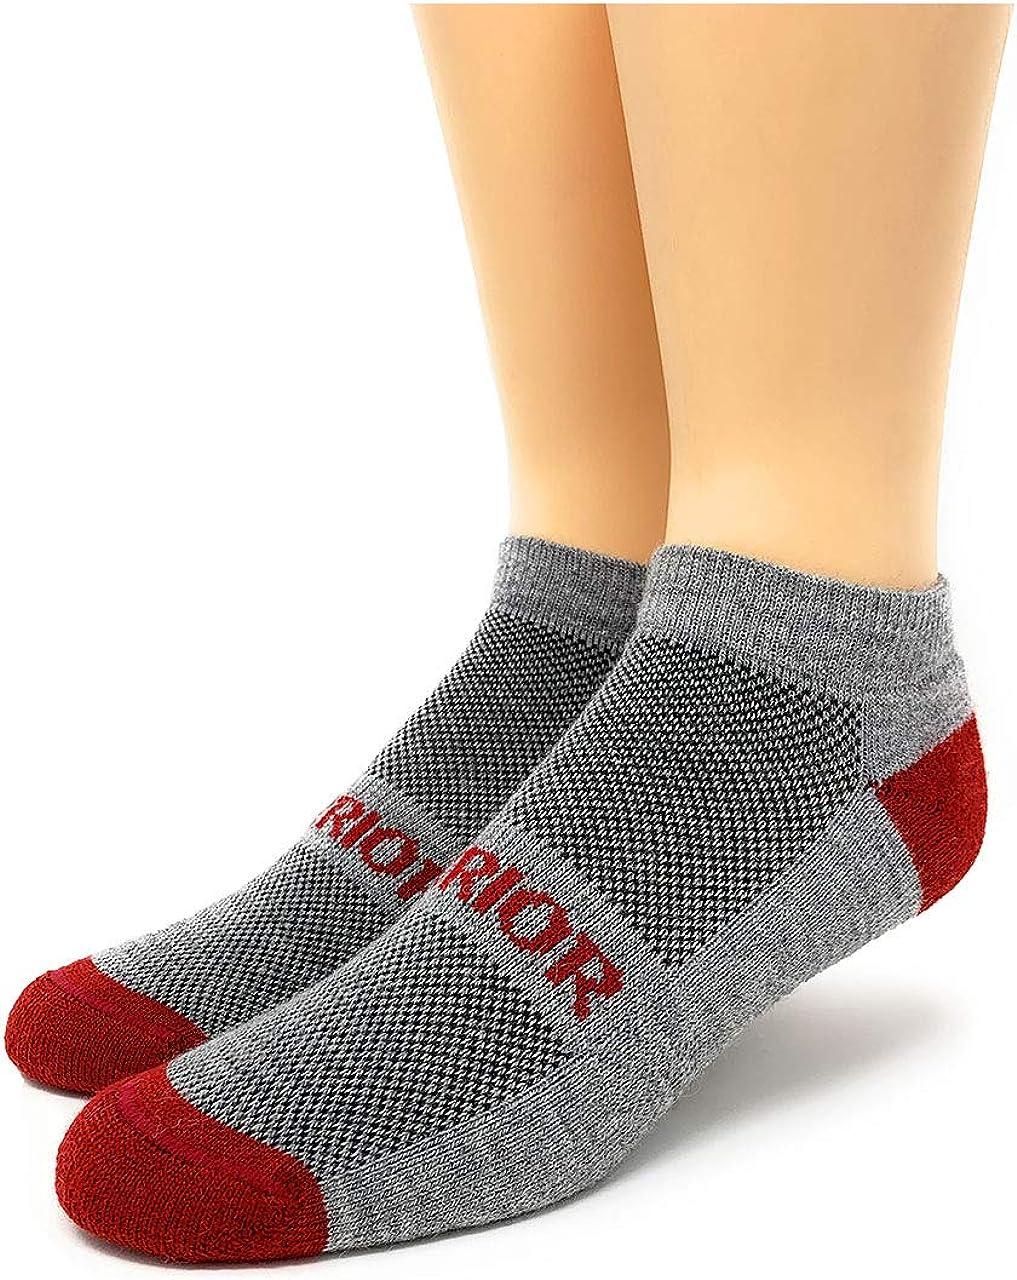 Fashion Warrior Alpaca Socks Selling - Wool All Ankle Sport Terrain